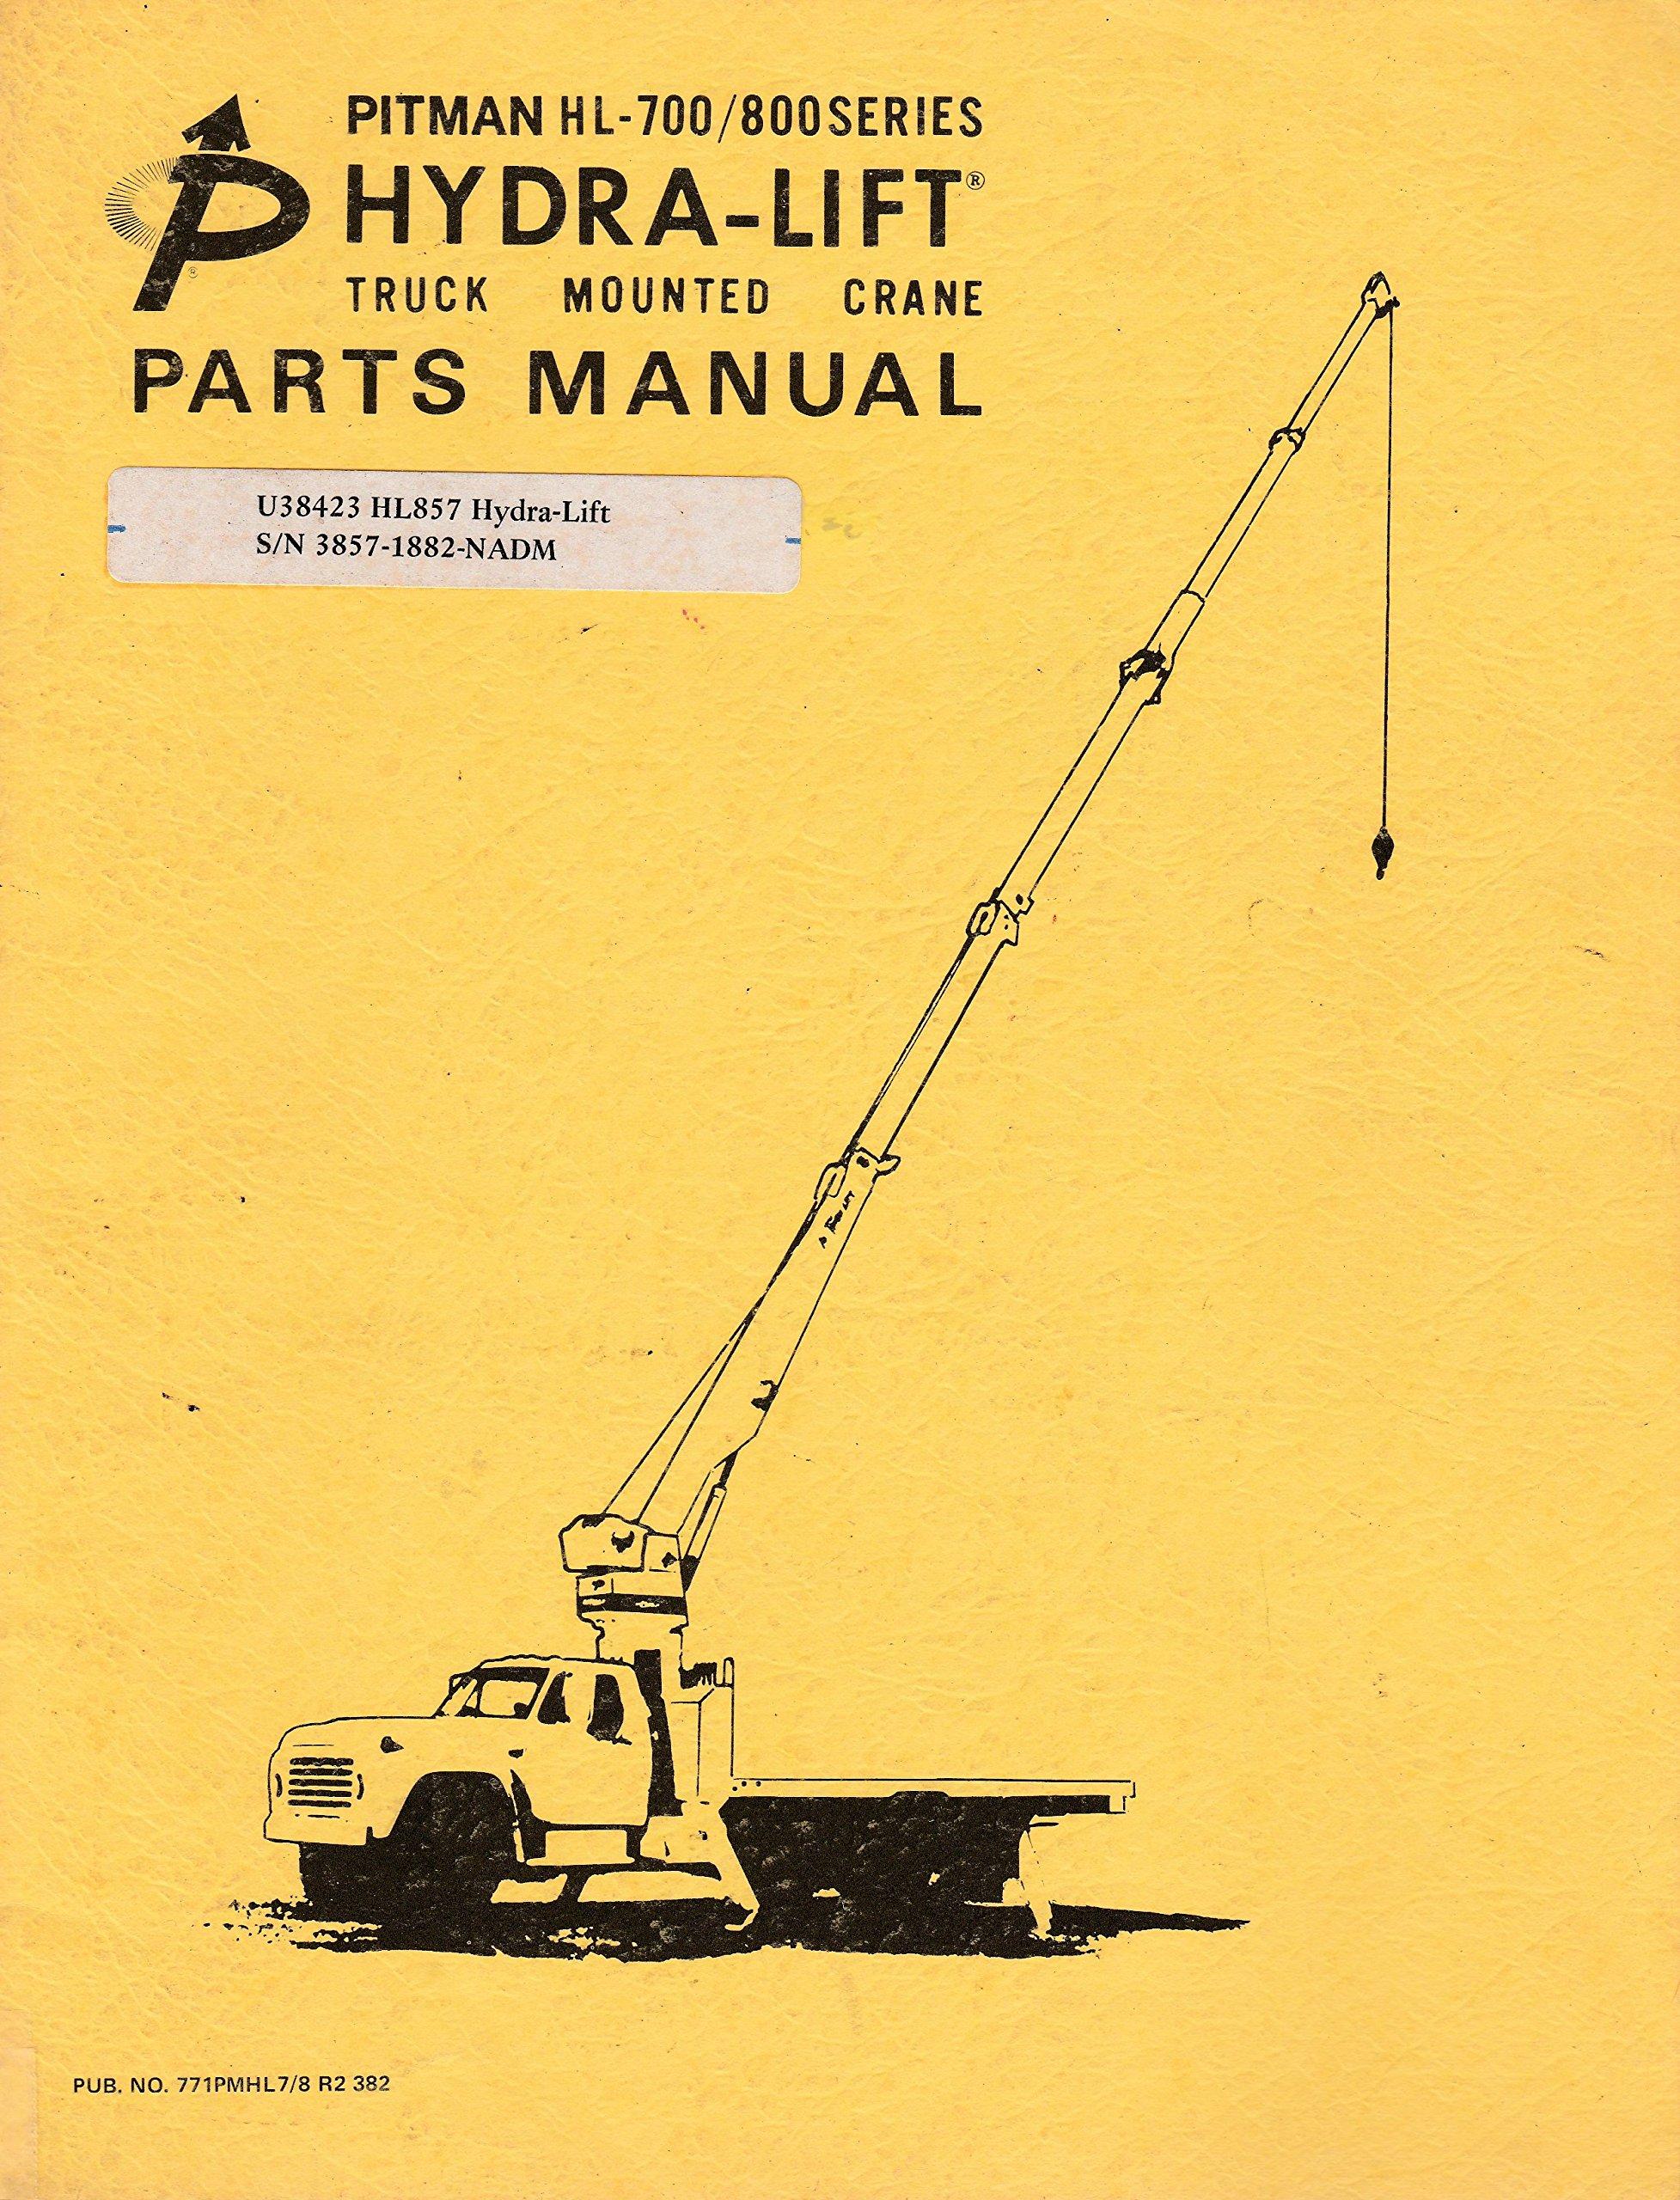 Pitman HL-700/800 Series Hydra-Lift : Truck Mounted Crane Parts